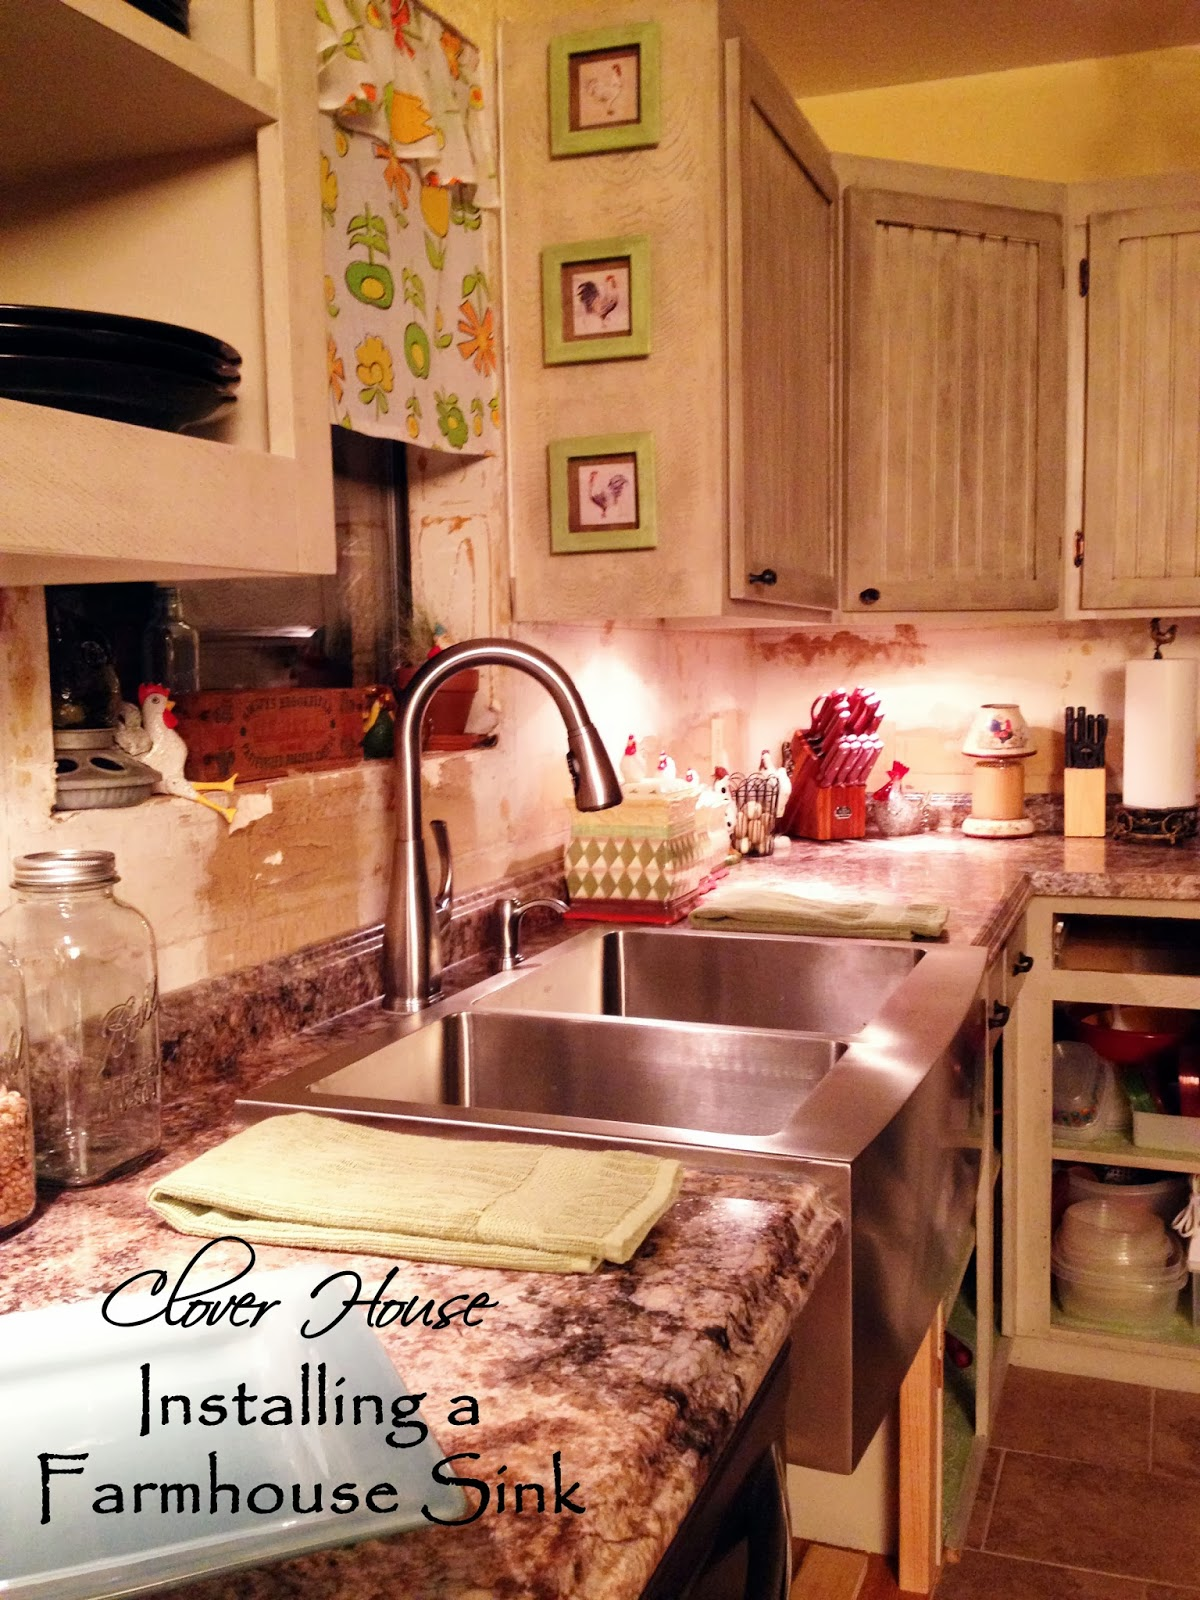 Installing A Farmhouse Sink : Clover House: Installing A Farmhouse Sink